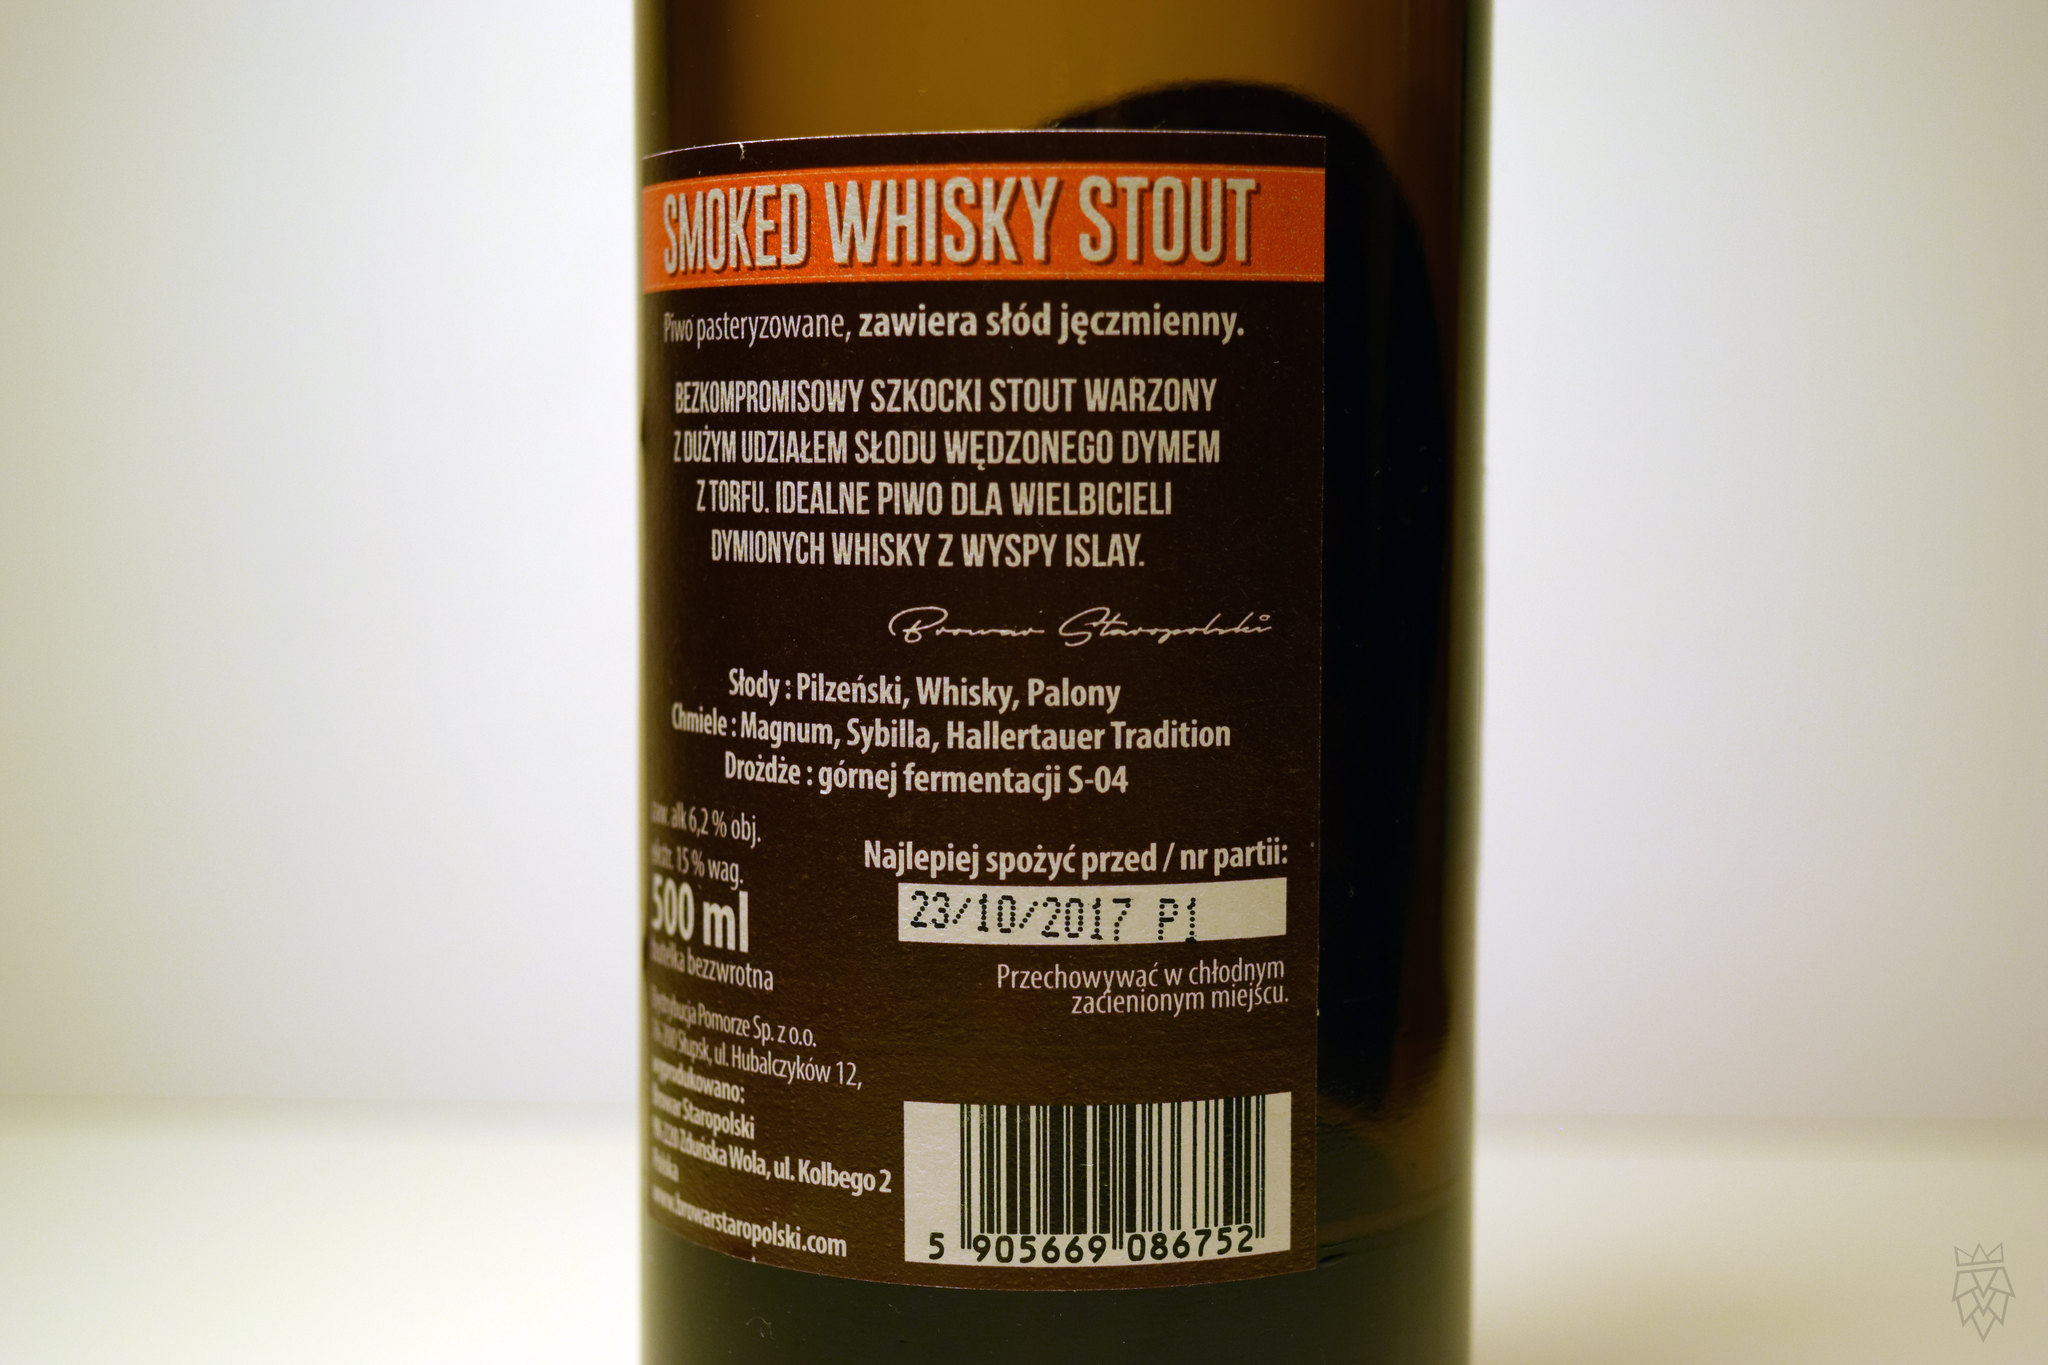 whisky stout etykieta